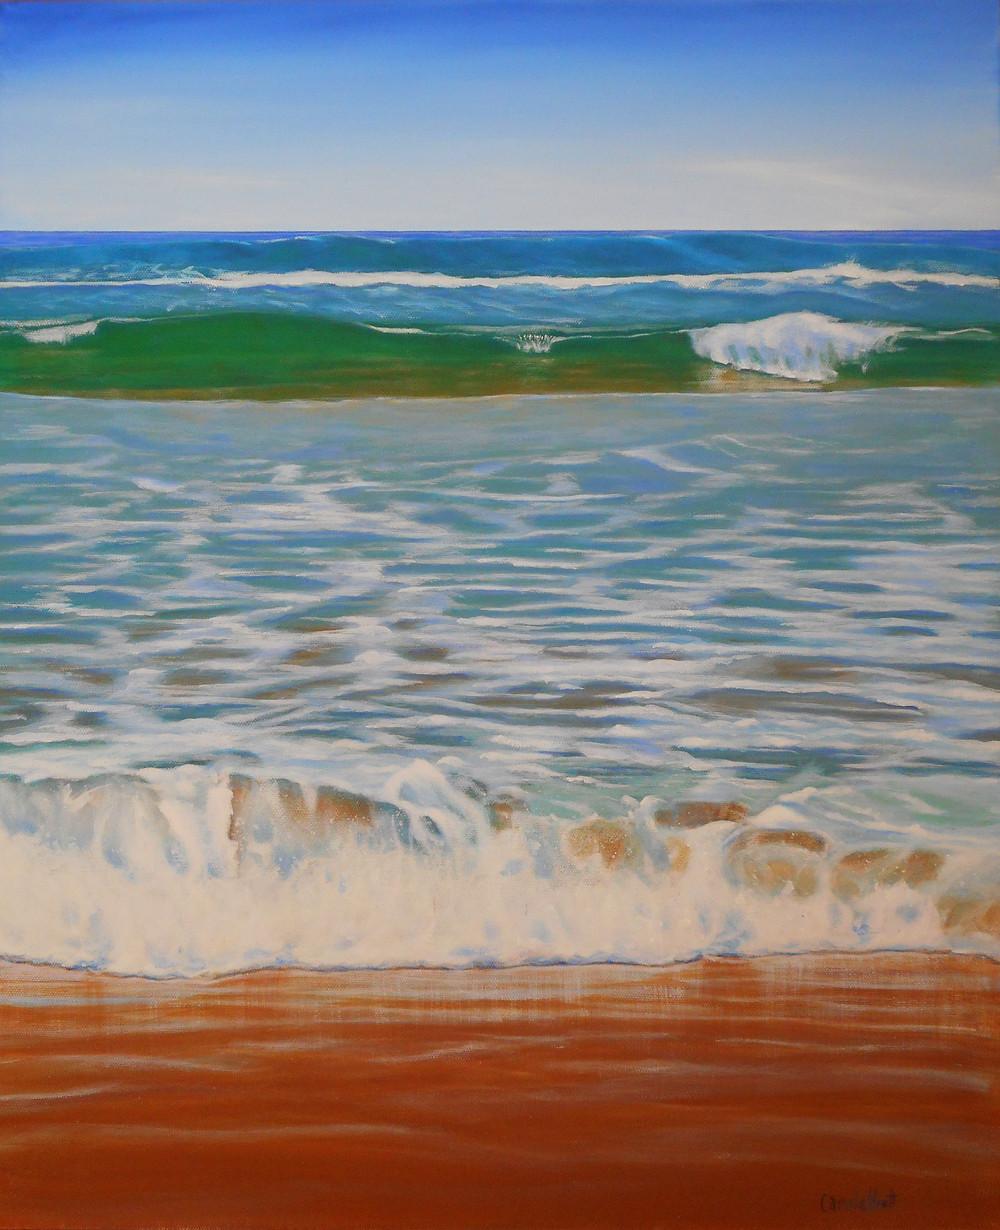 """It's a Shore Thing"" by Carole Elliott"